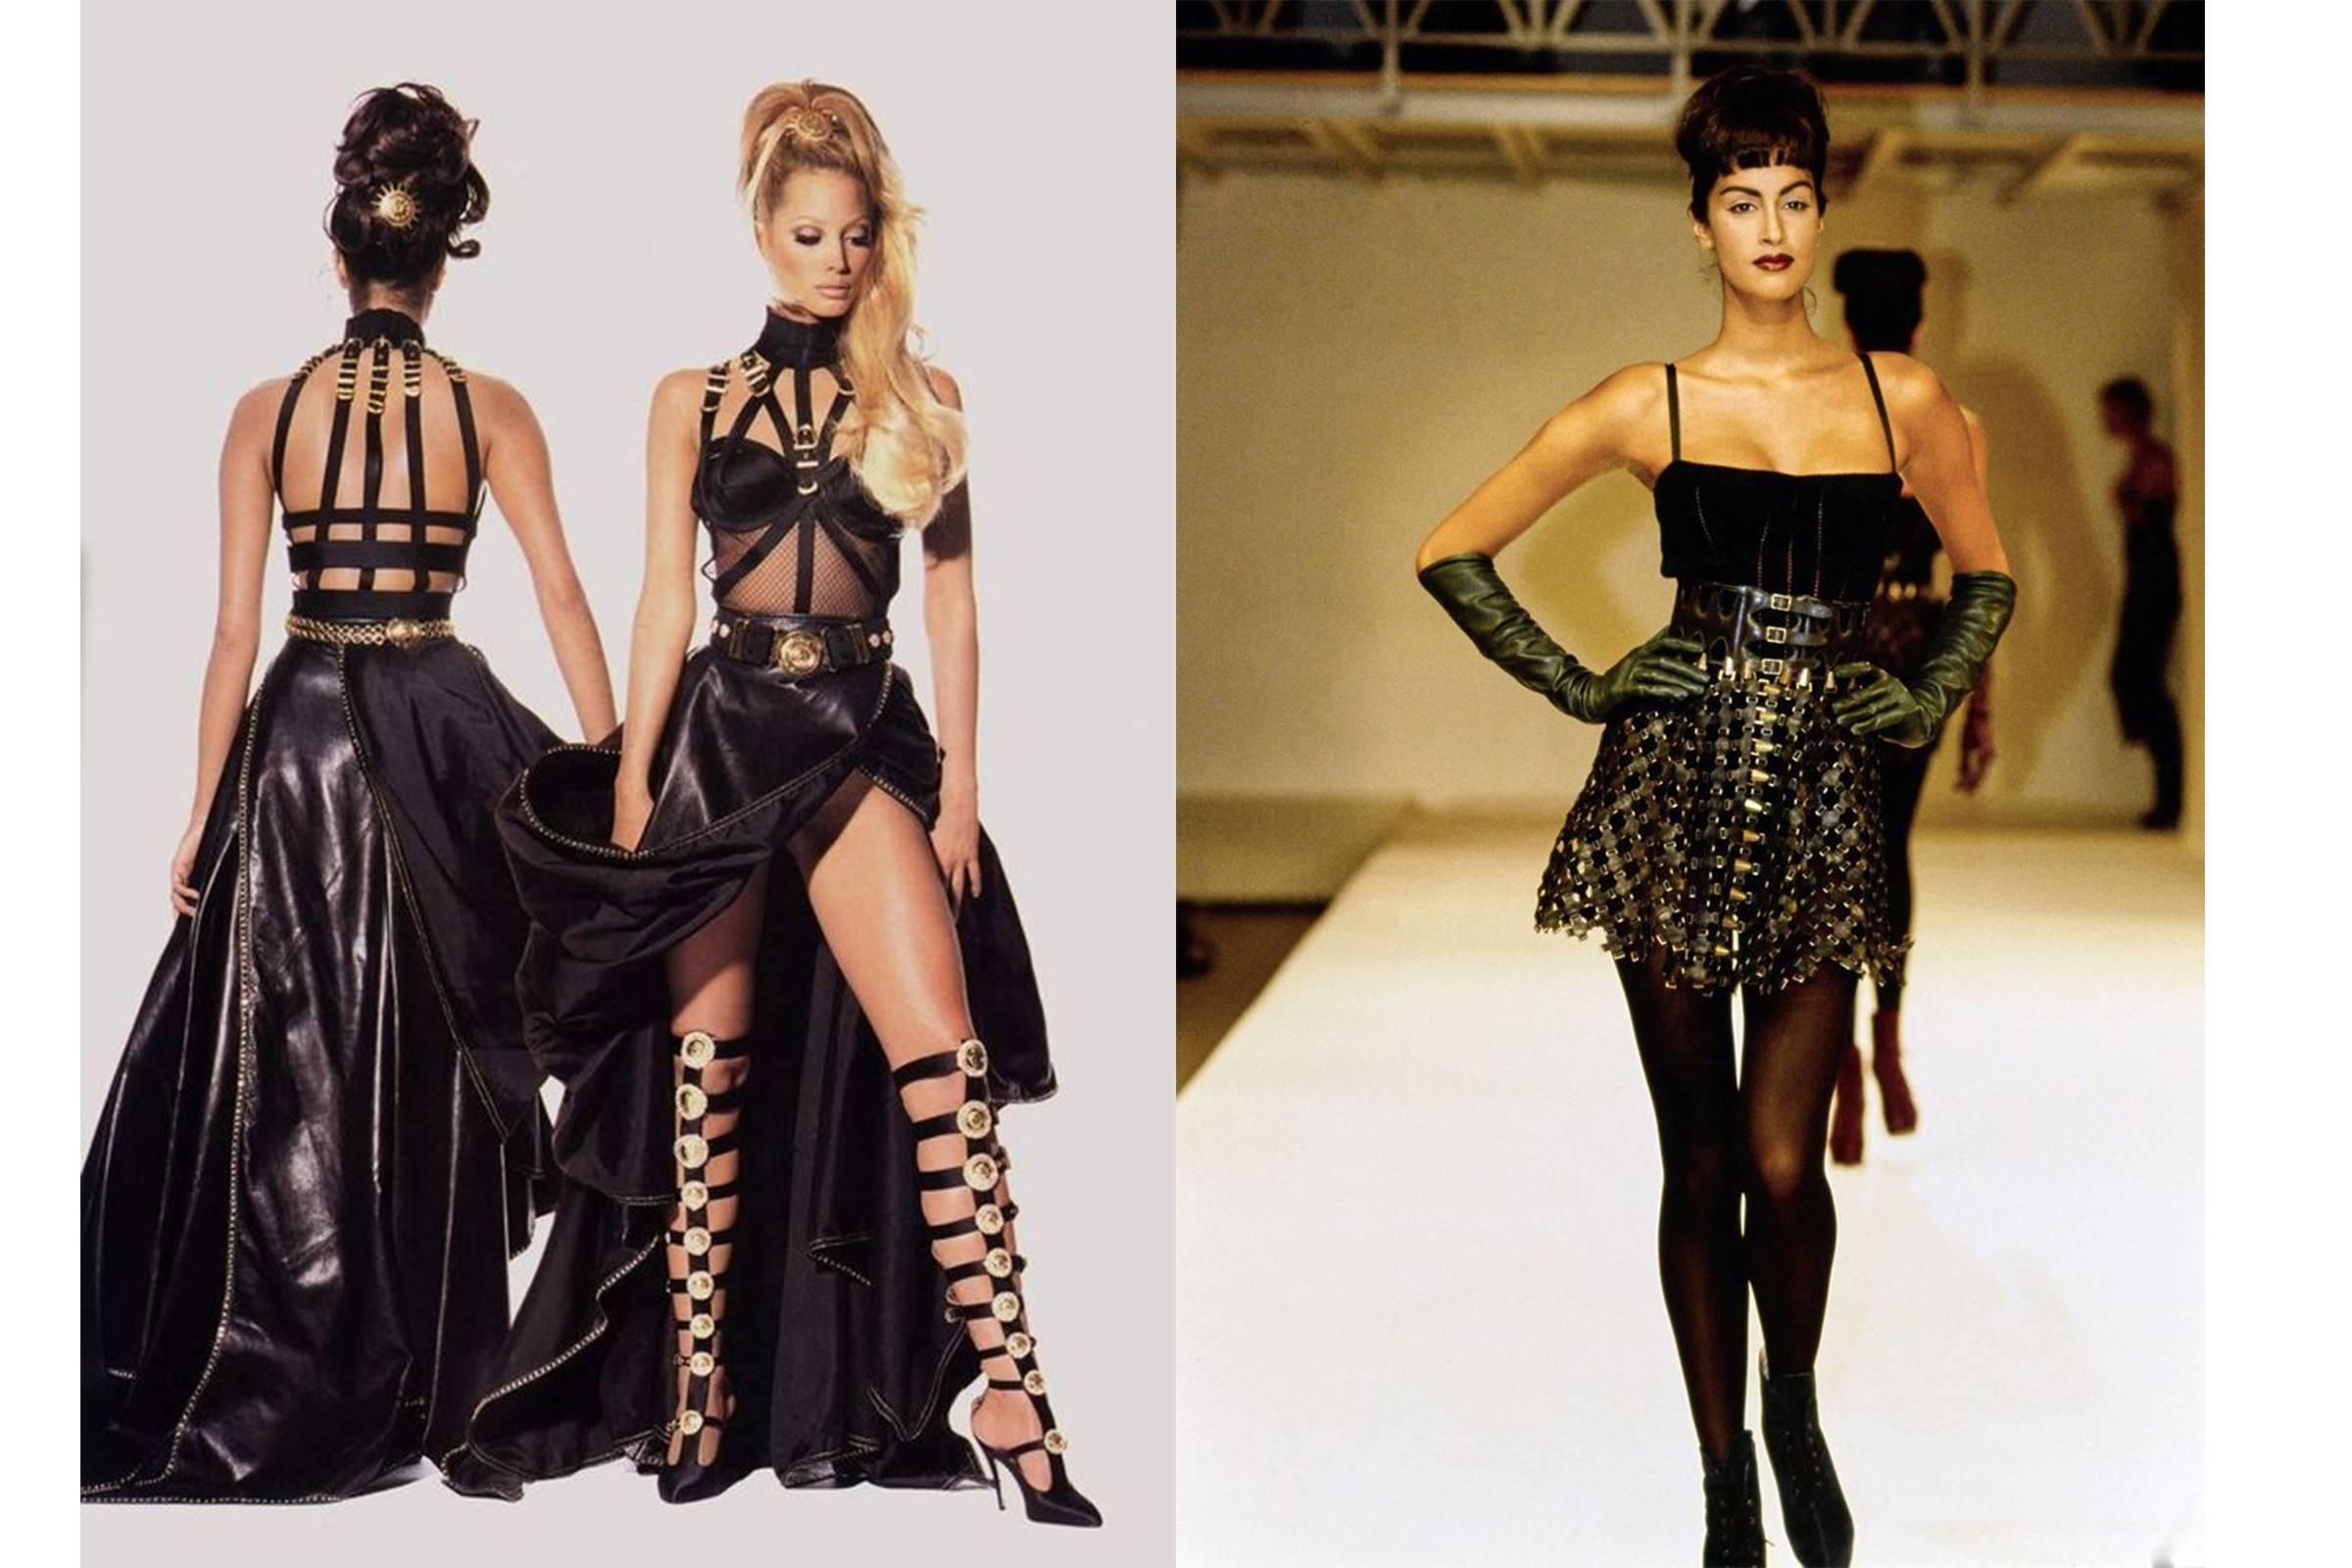 Heroine: Fetish As Fashion